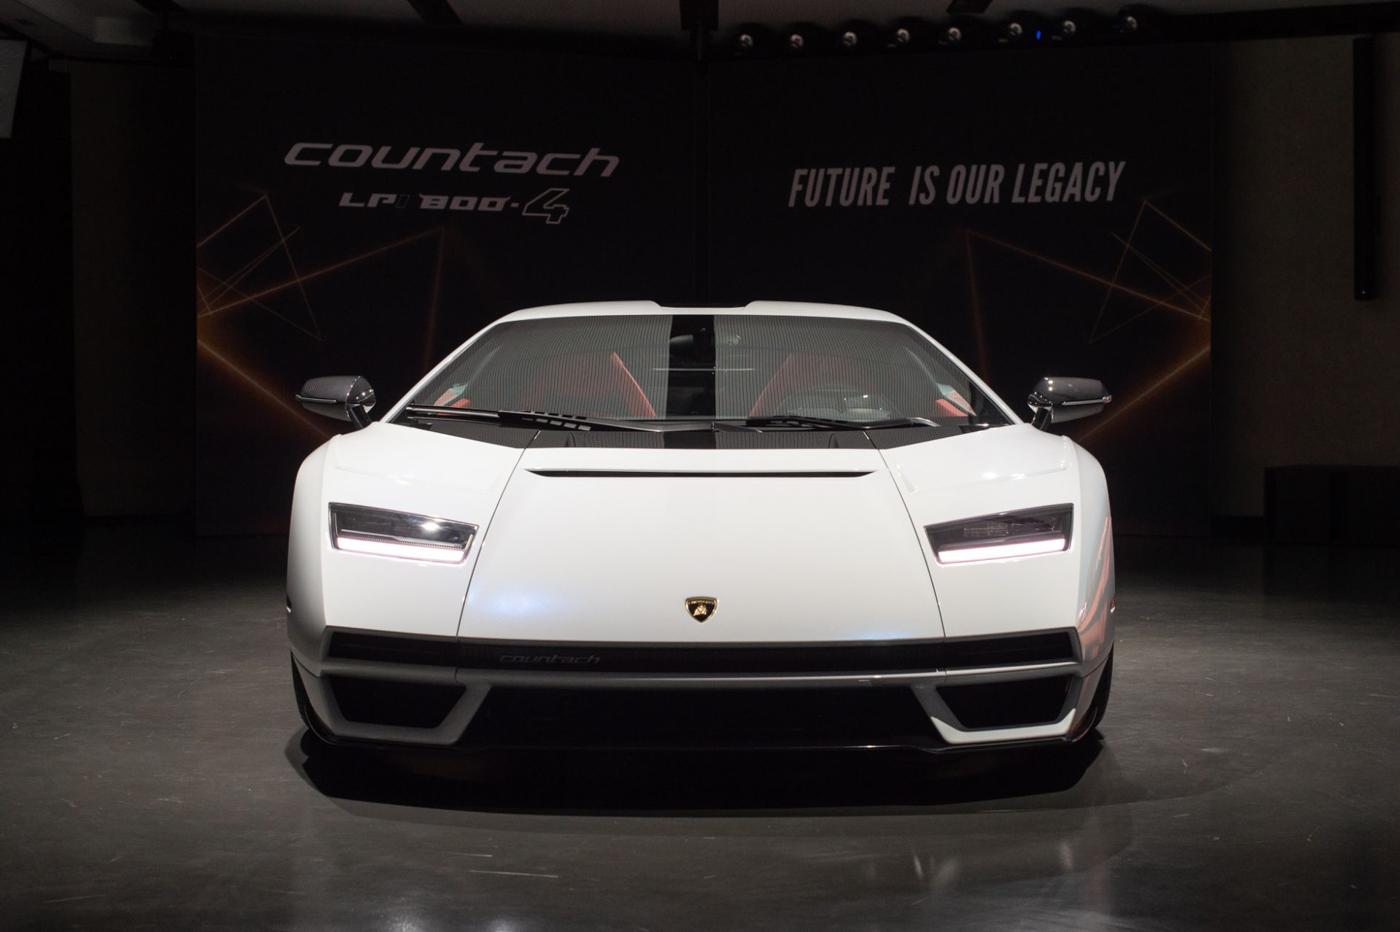 Lamborghini Countach LPI 800-4 (18).JPG